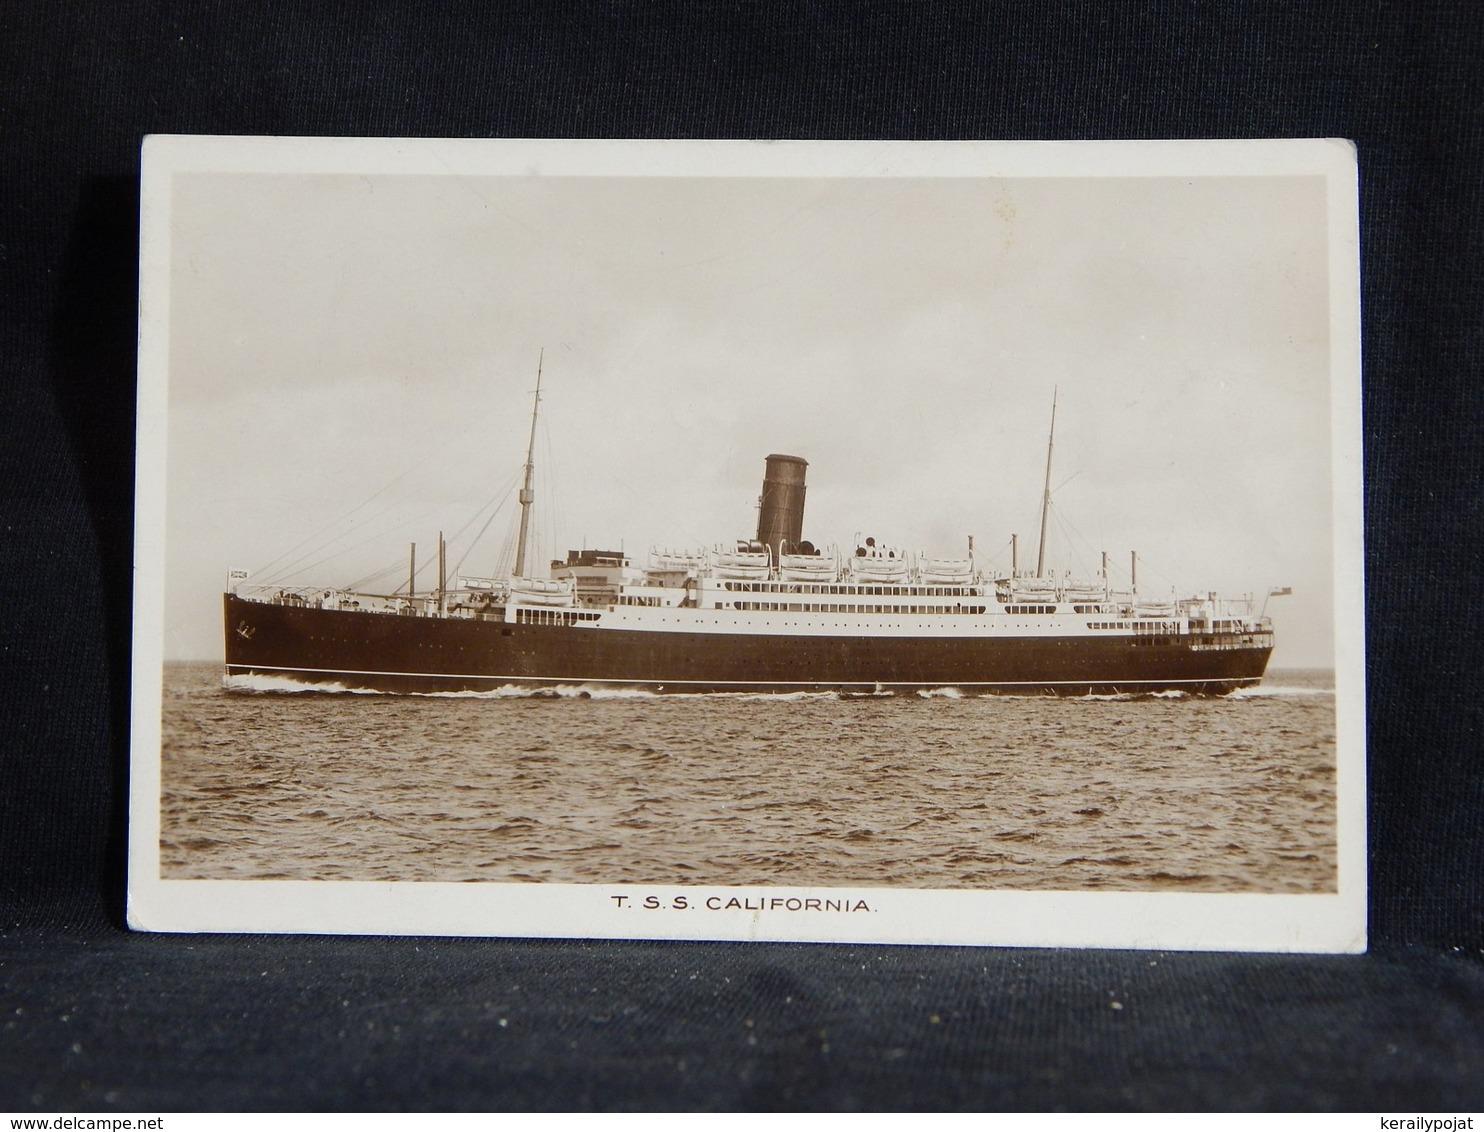 Steamer T.S.S. California__(22740) - Paquebote